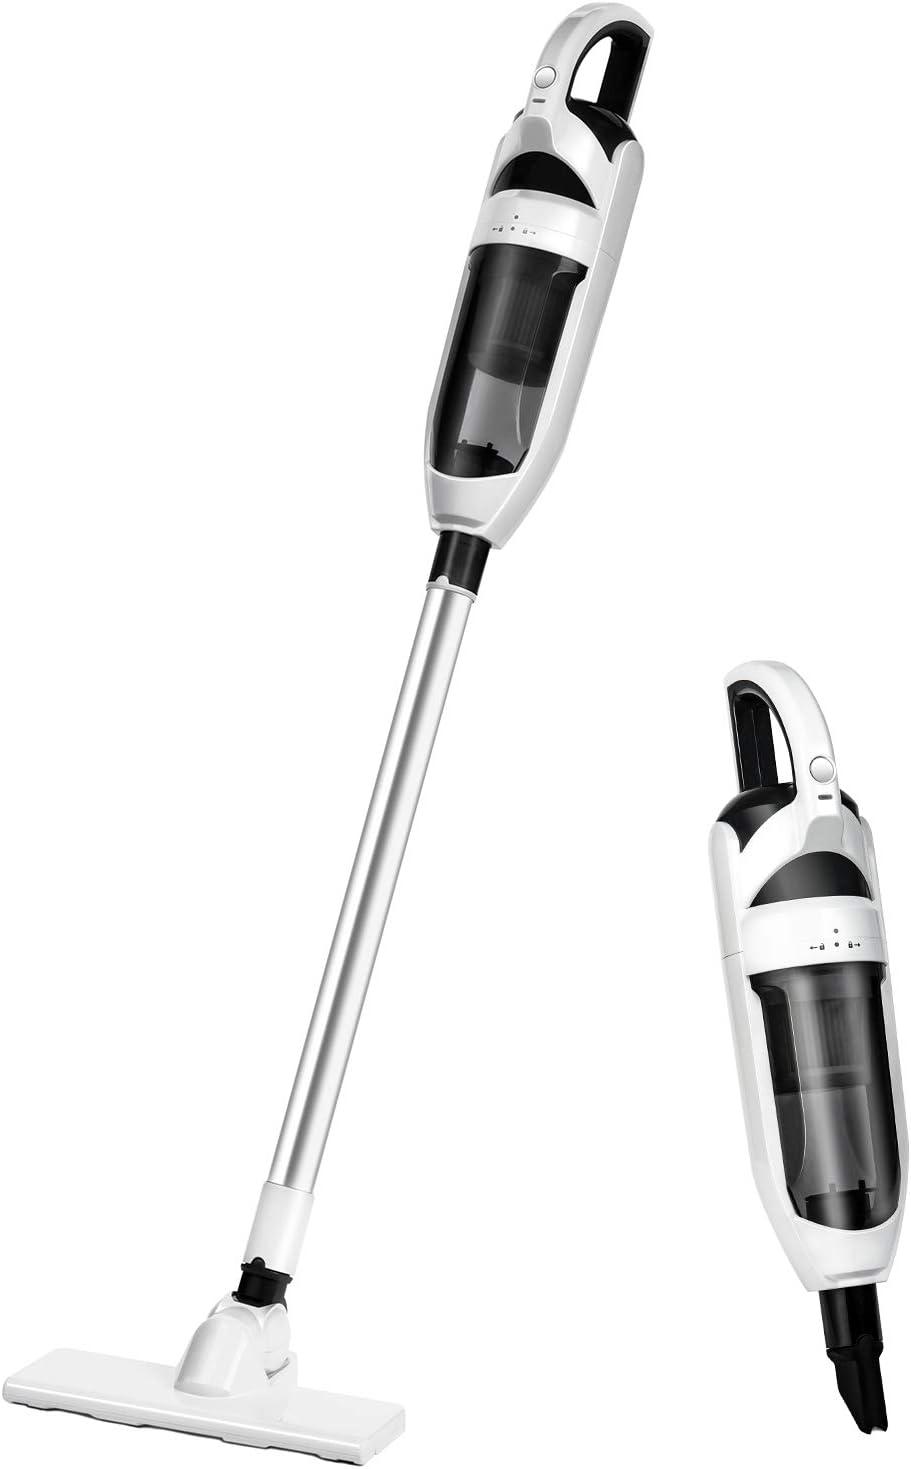 Akiiva Aspiradora Escoba sin Cable de 10Kpa, Aspirador Vertical 2 en 1, 600ml, con HEPA Filtros Lavables y 3 Cepillos, Batería de 2200mAh Recargable para Hogar Piso Coche